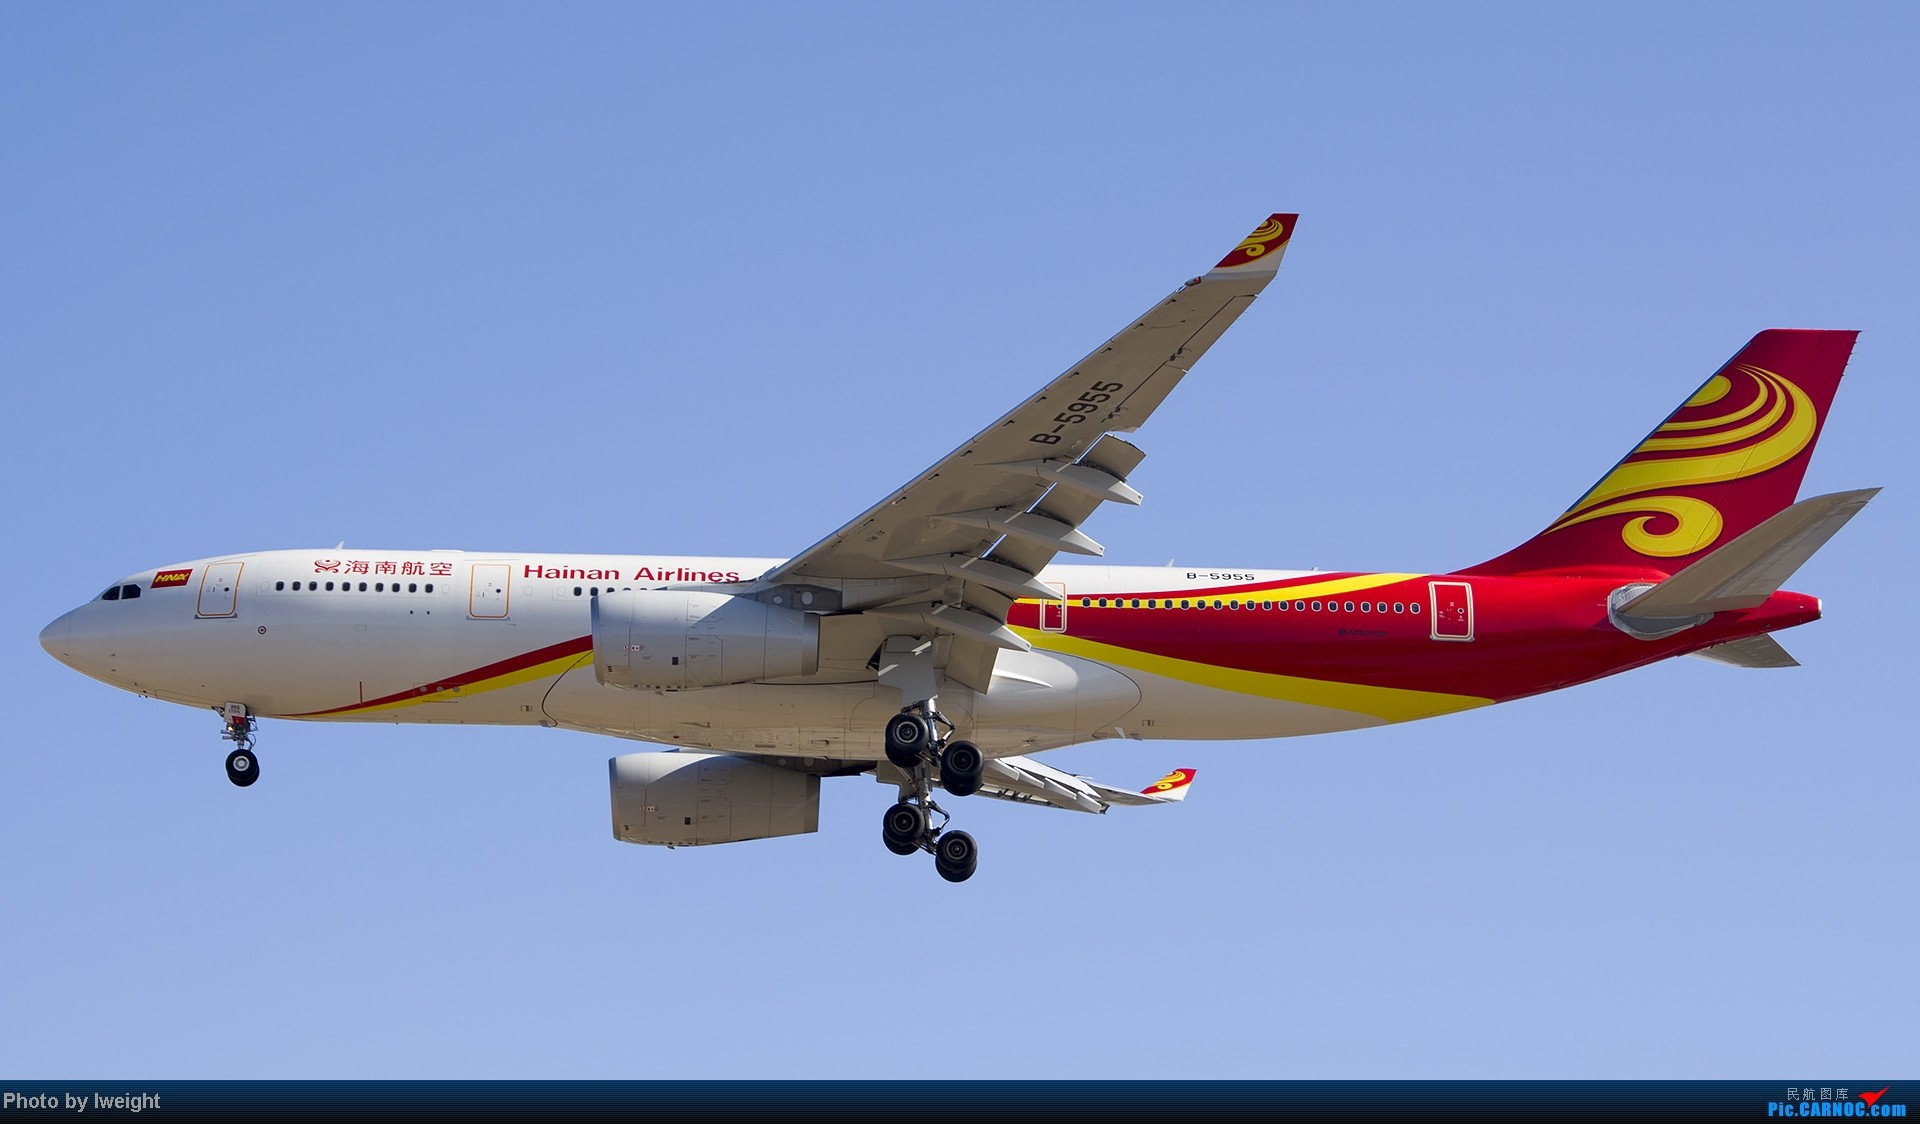 Re:[原创]抓住APEC蓝的尾巴,再拍上一组 AIRBUS A330-200 B-5955 中国北京首都机场